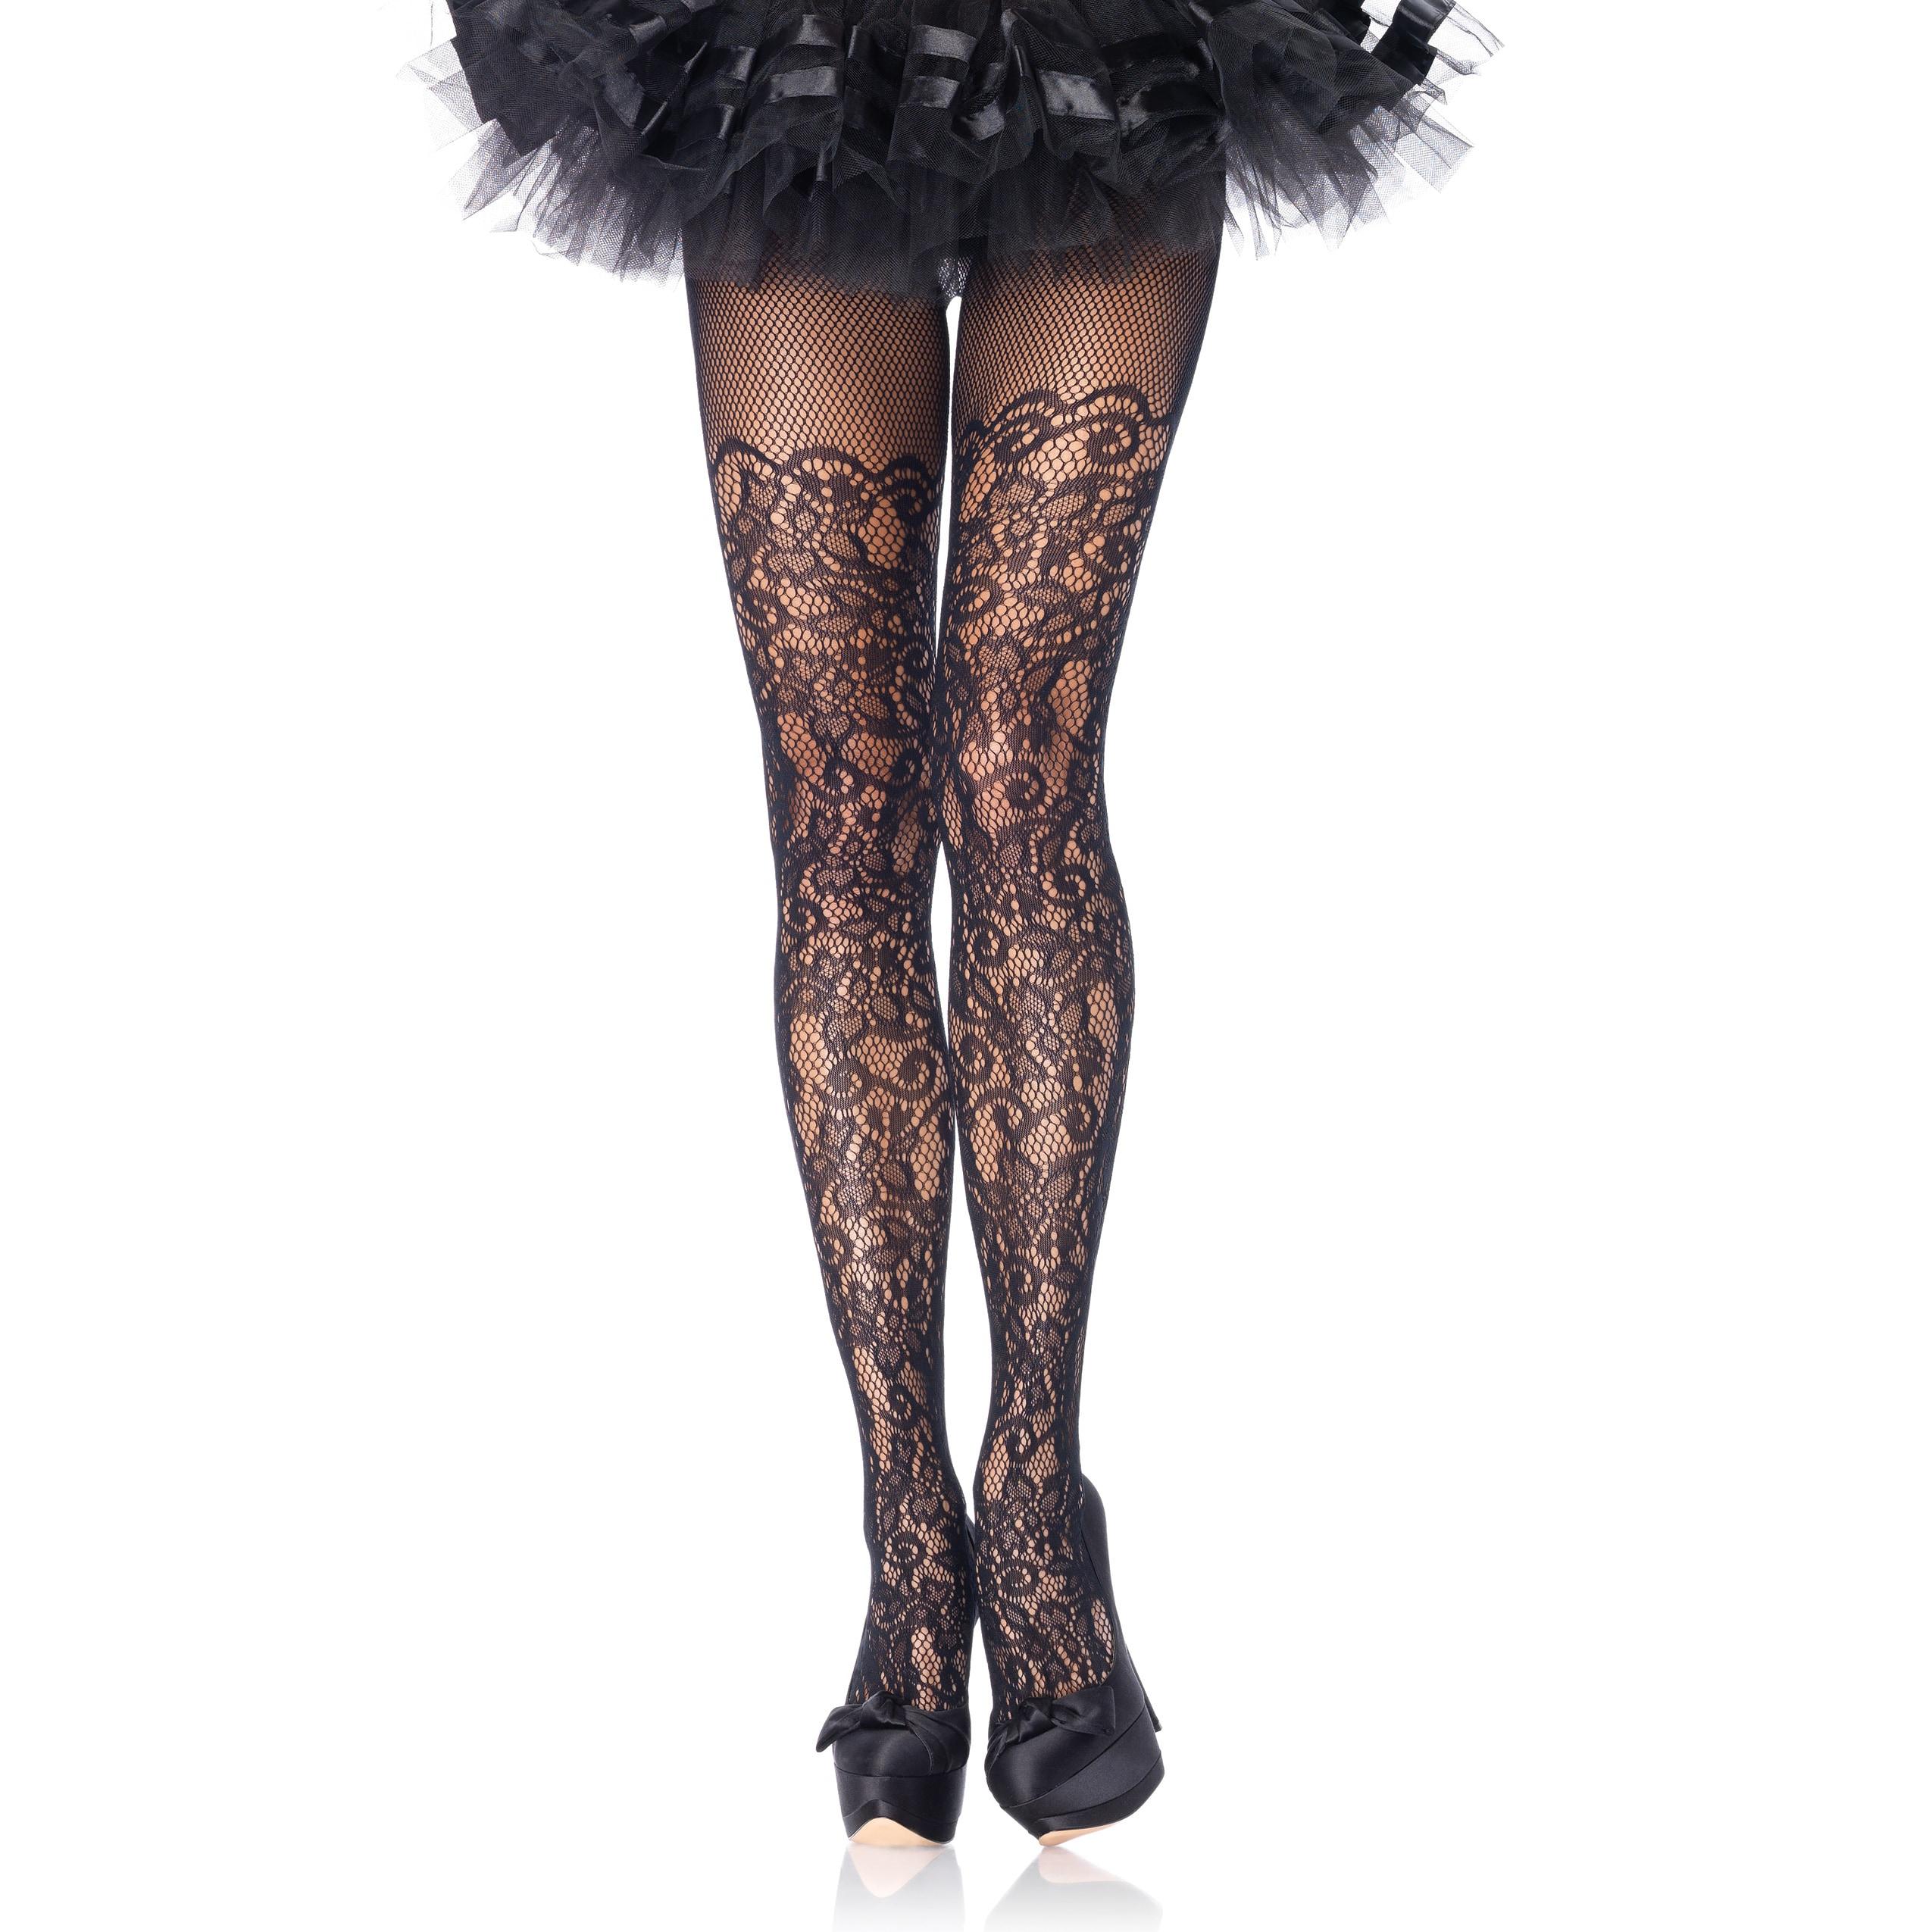 f705128bc Shop Leg Avenue Women s Black Nylon-blend Plus-size Floral Vine Net  Pantyhose - Free Shipping On Orders Over  45 - Overstock.com - 14174508